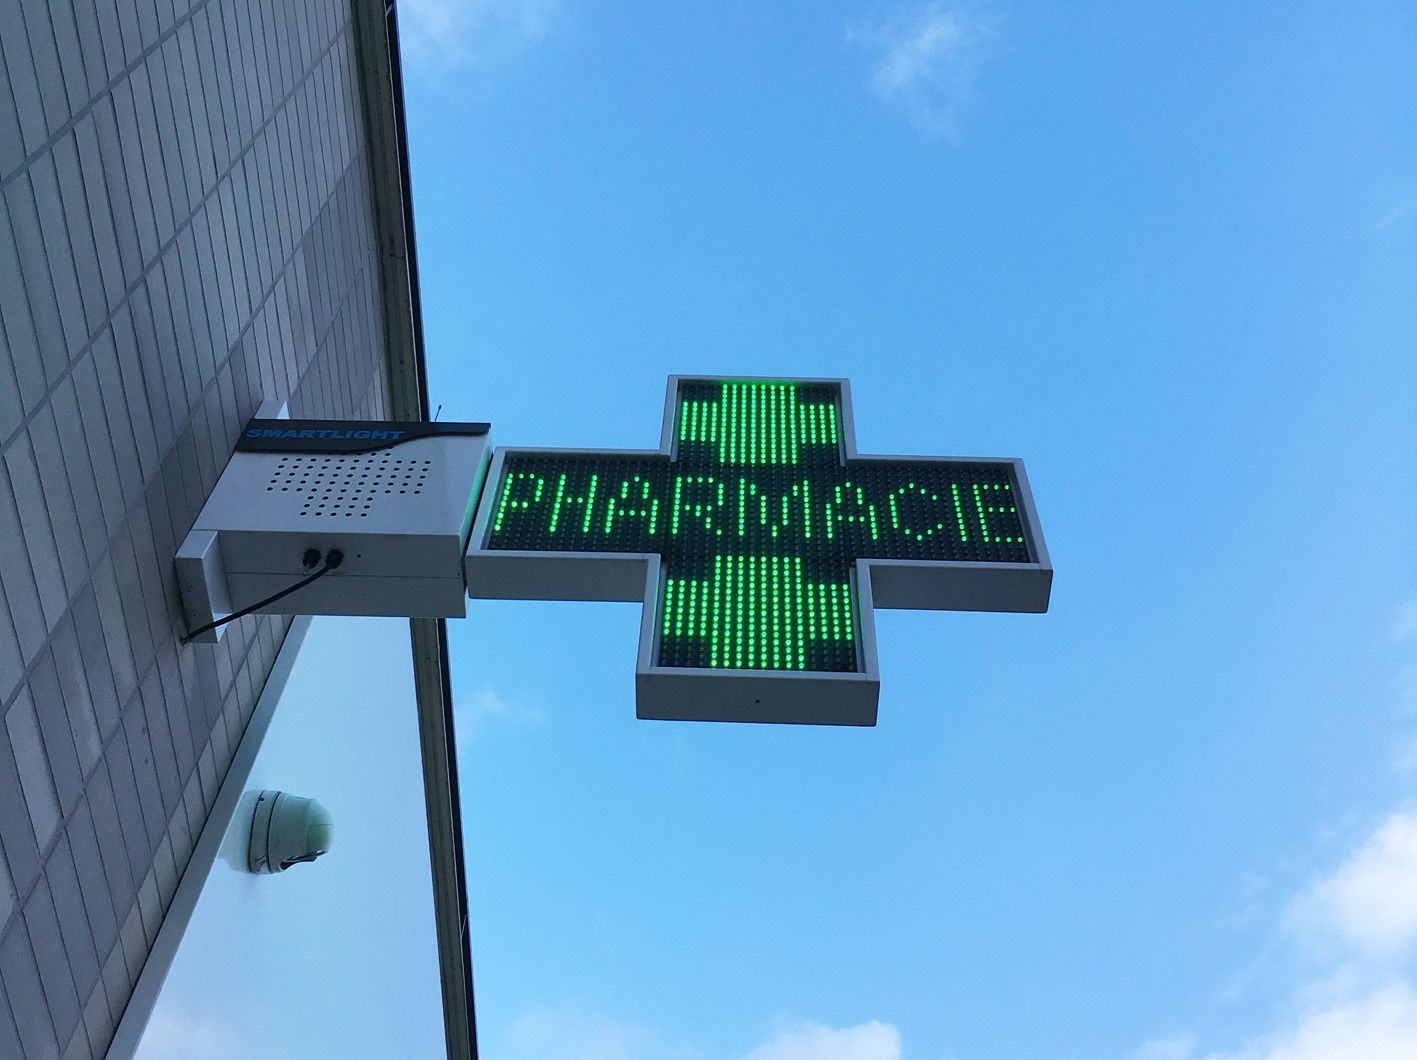 Les Pharmacies De Garde